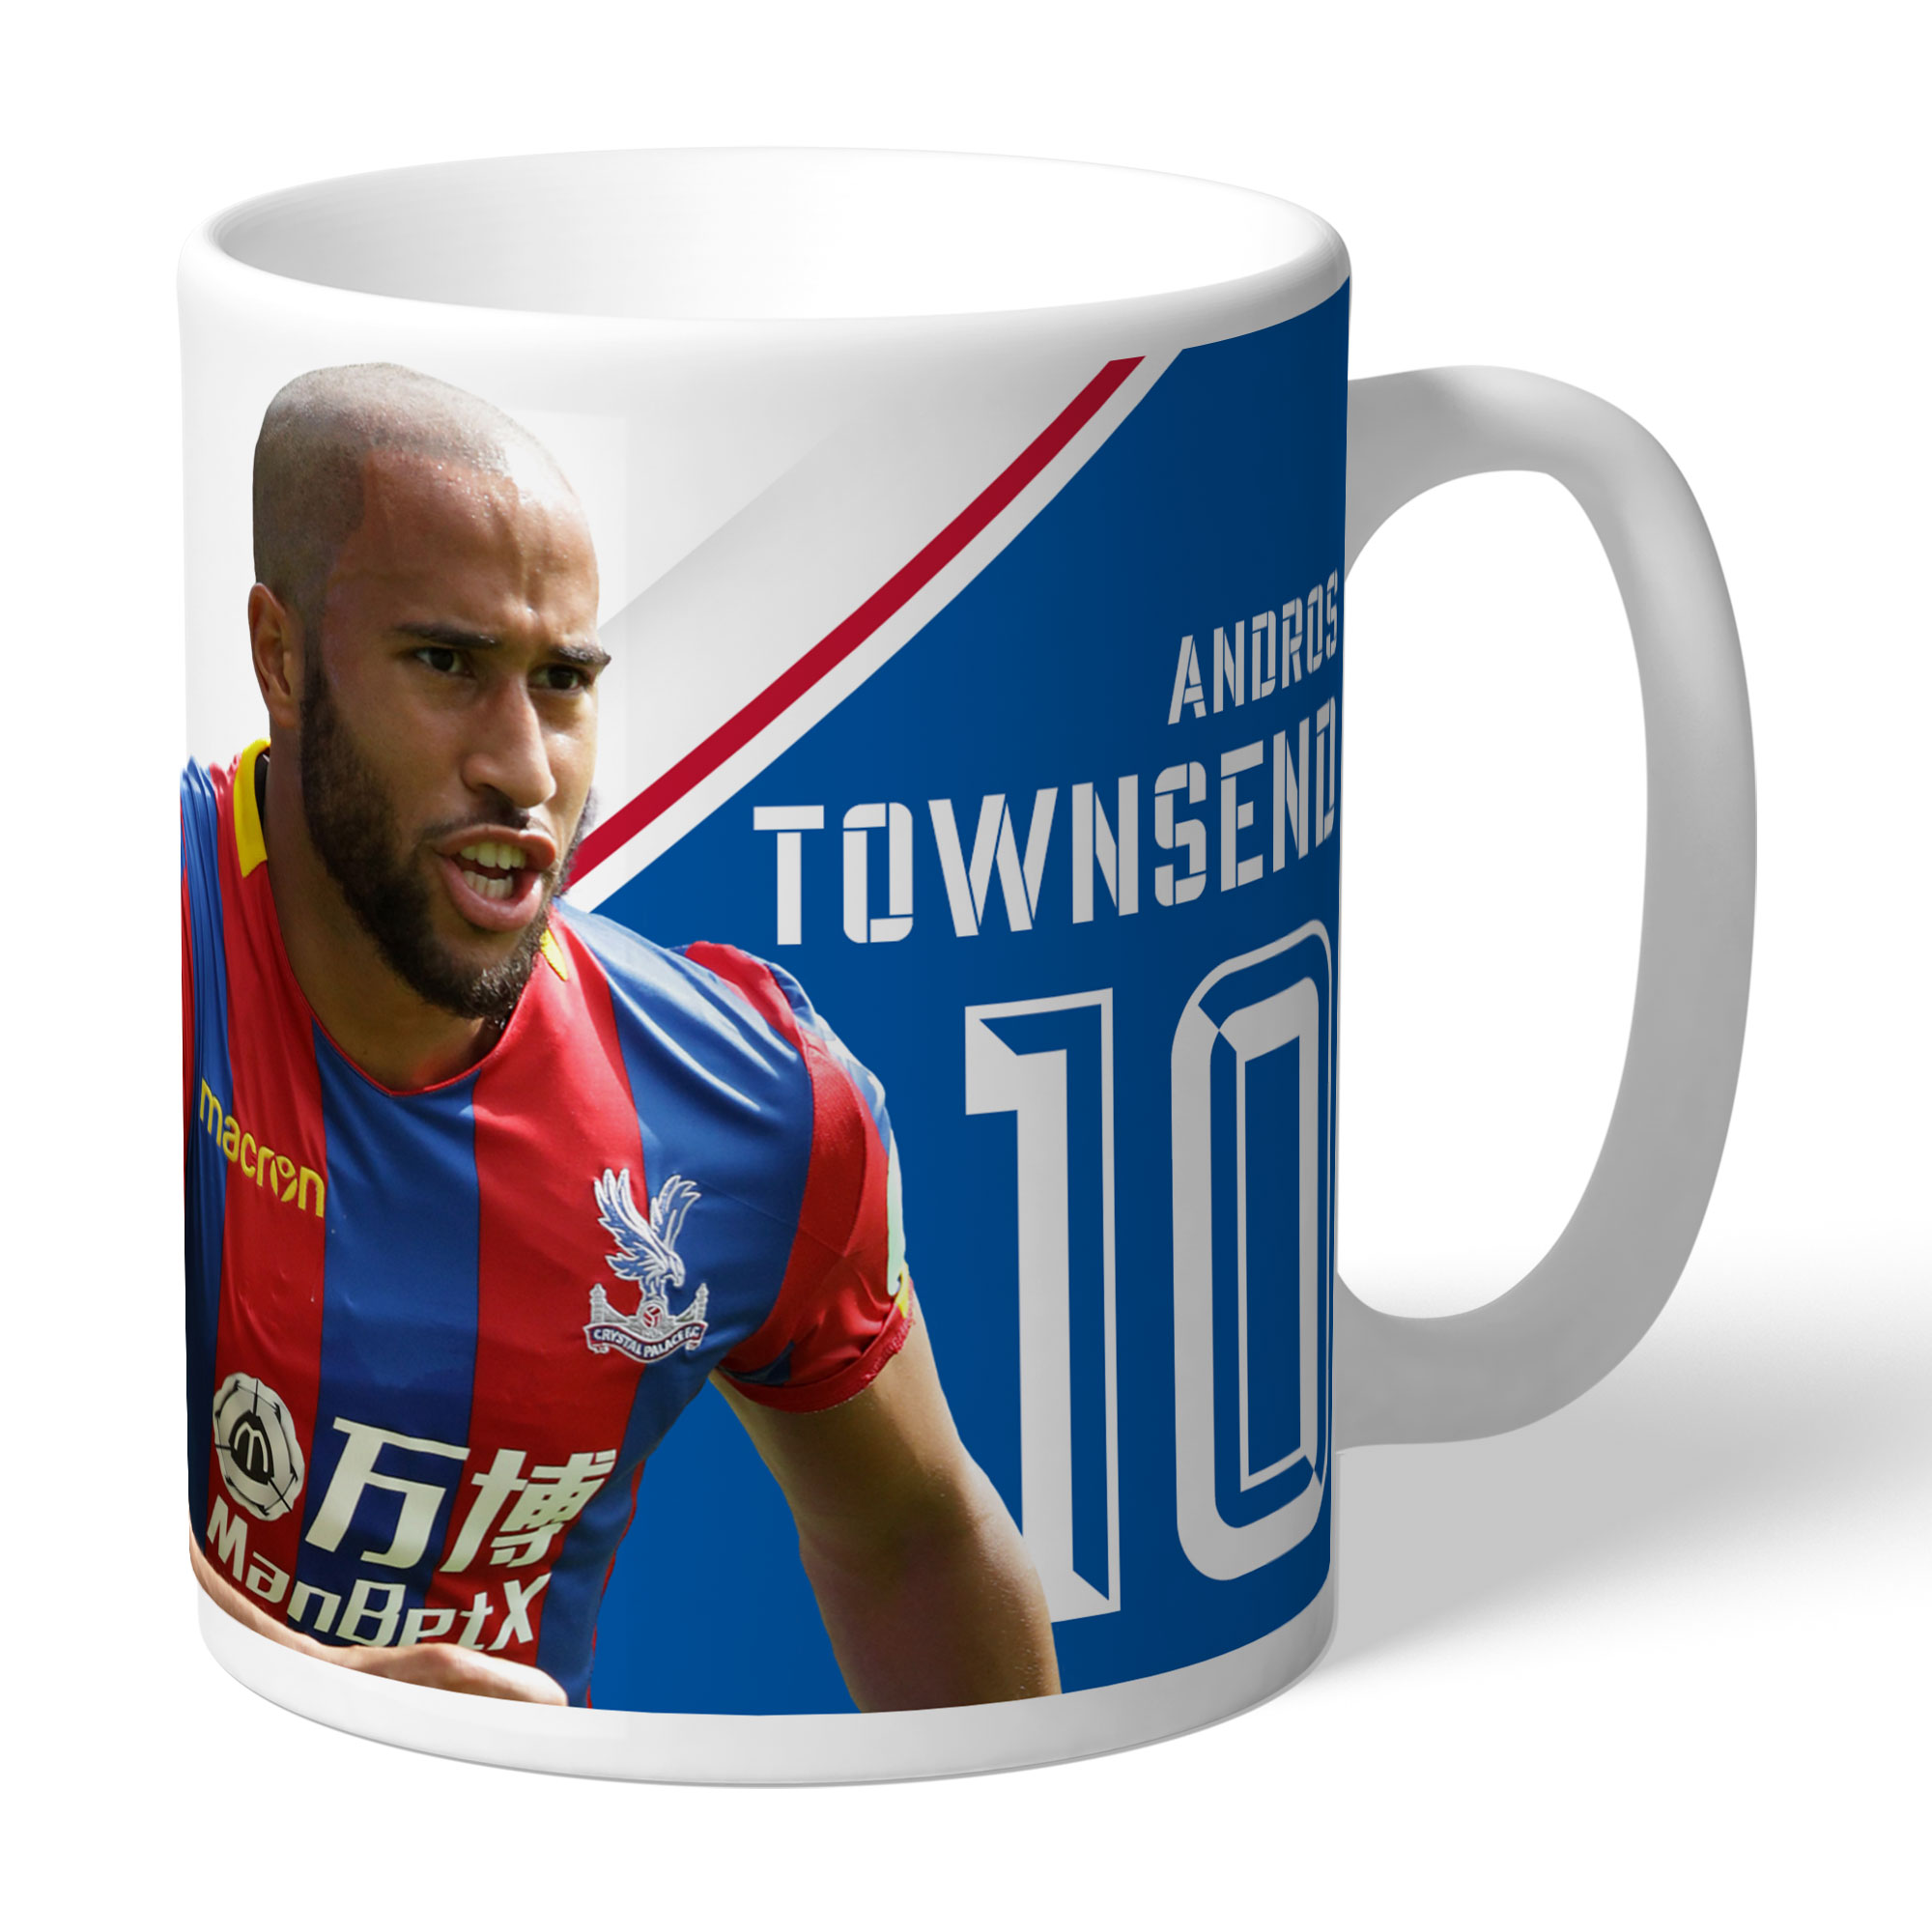 Crystal Palace FC Townsend Autograph Mug